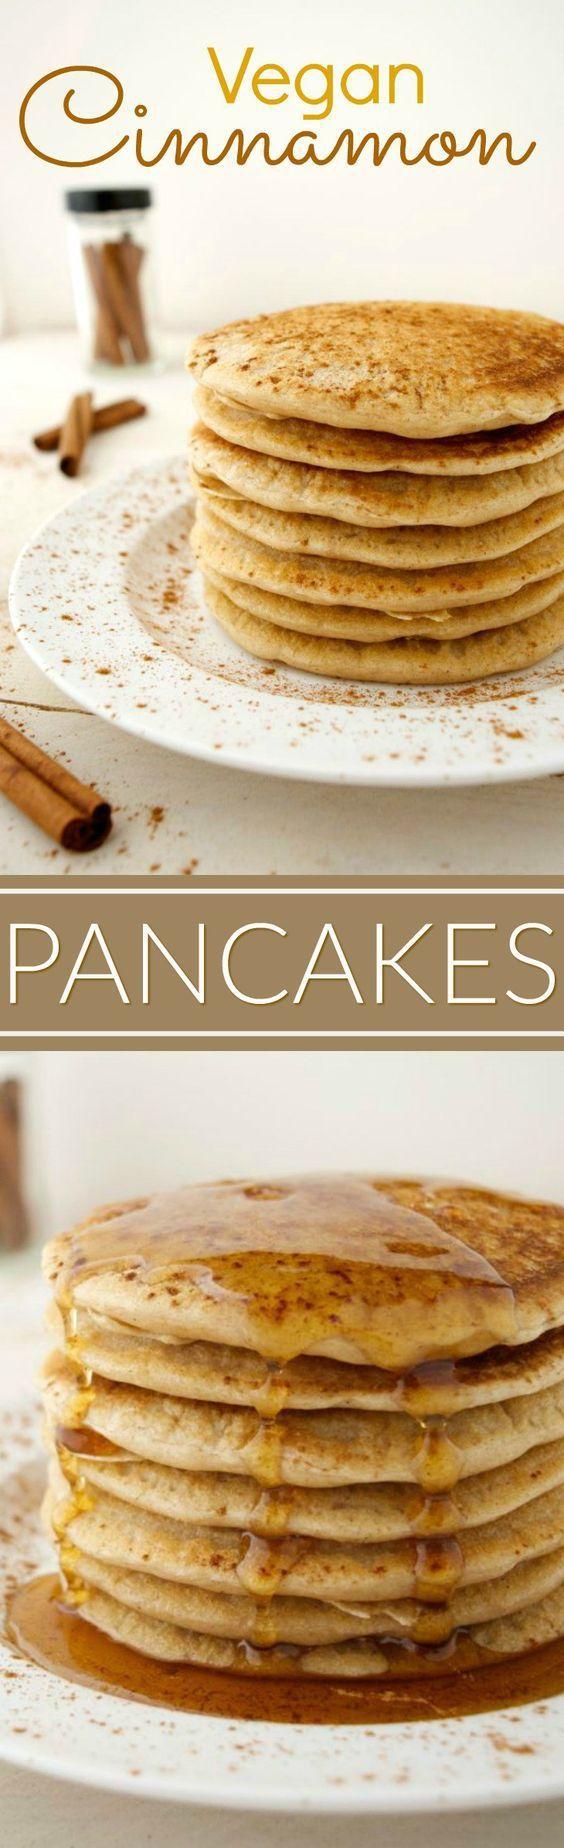 ... buttermilk pancakes with corn blueberry flax buttermilk pancakes